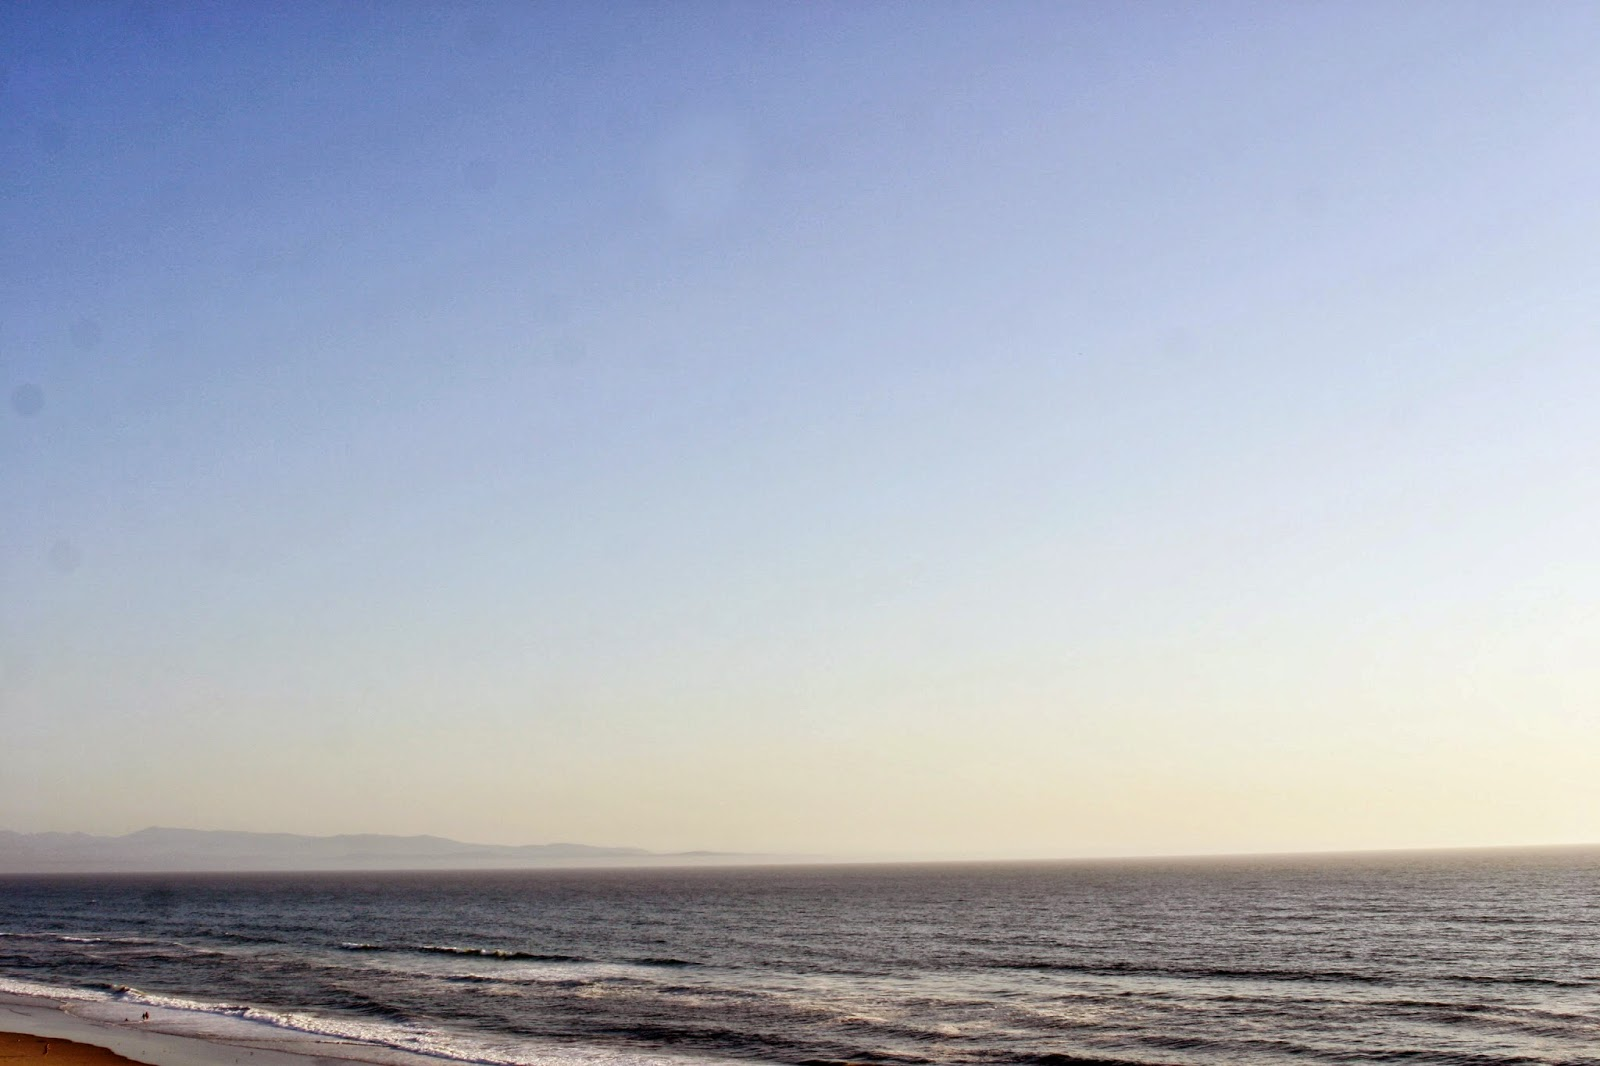 Beach Horizon picture wallpaper (1600 x 1066 )